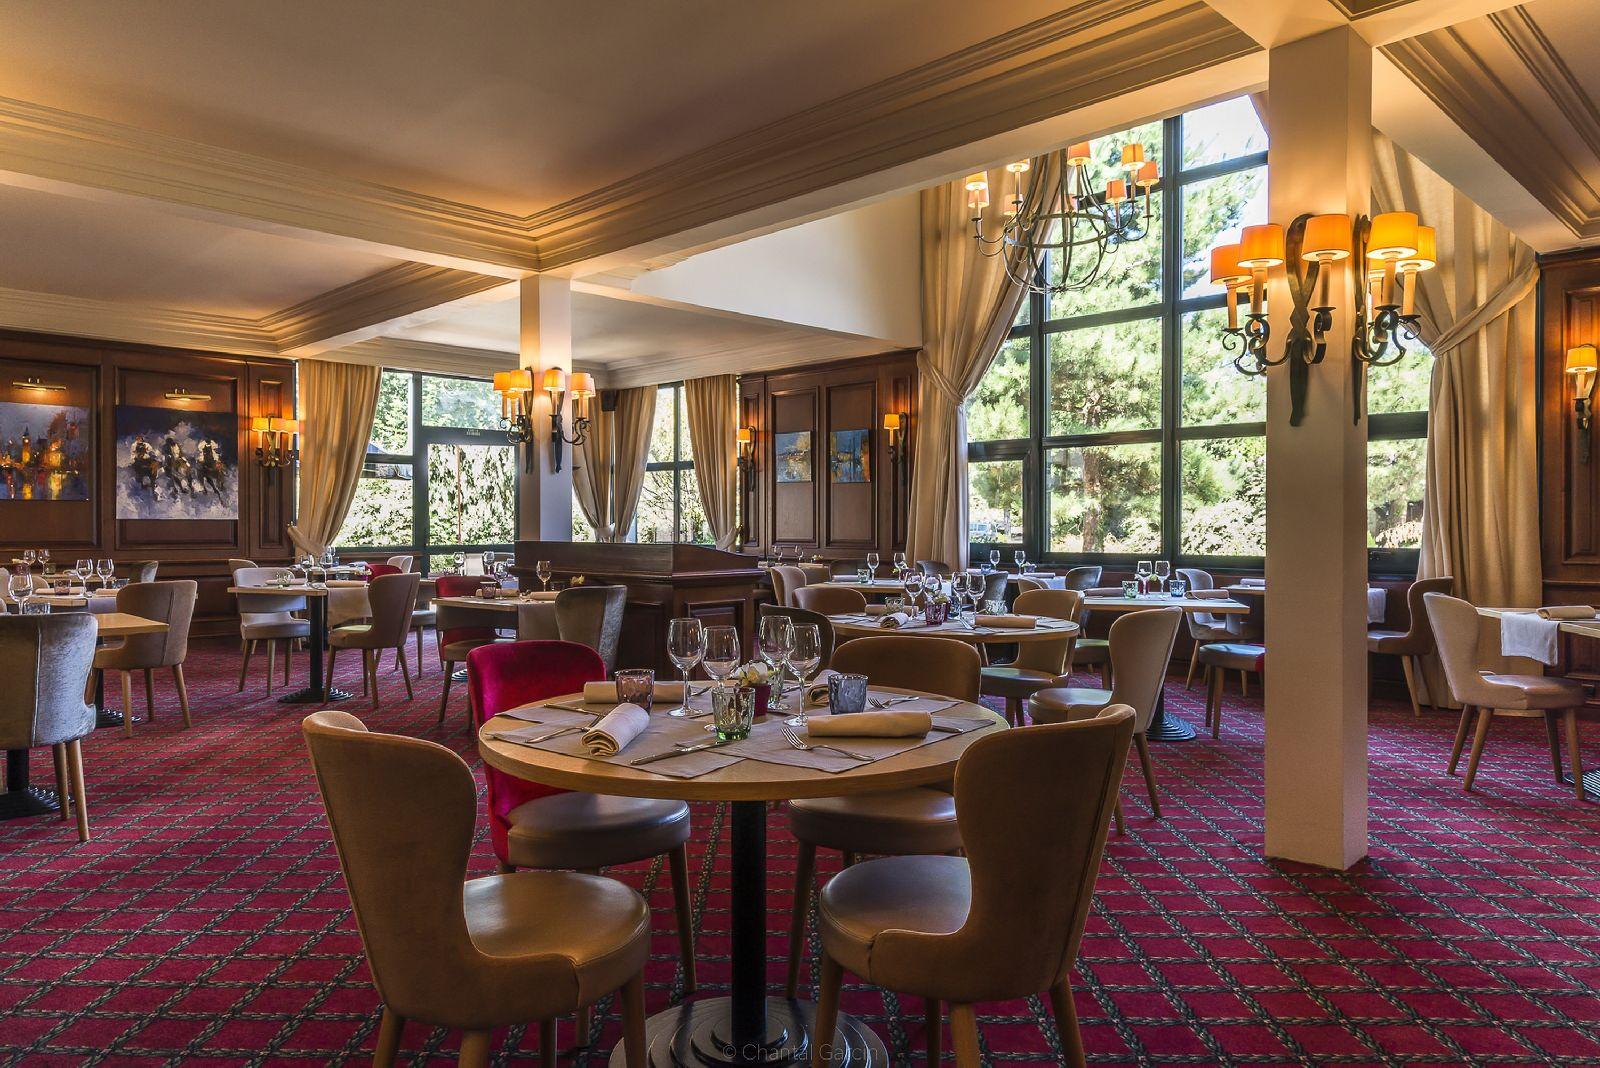 golf-expedition-golf-reizen-frankrijk-regio-pas-de-calais-hotel-du-parc-restaurant.jpg